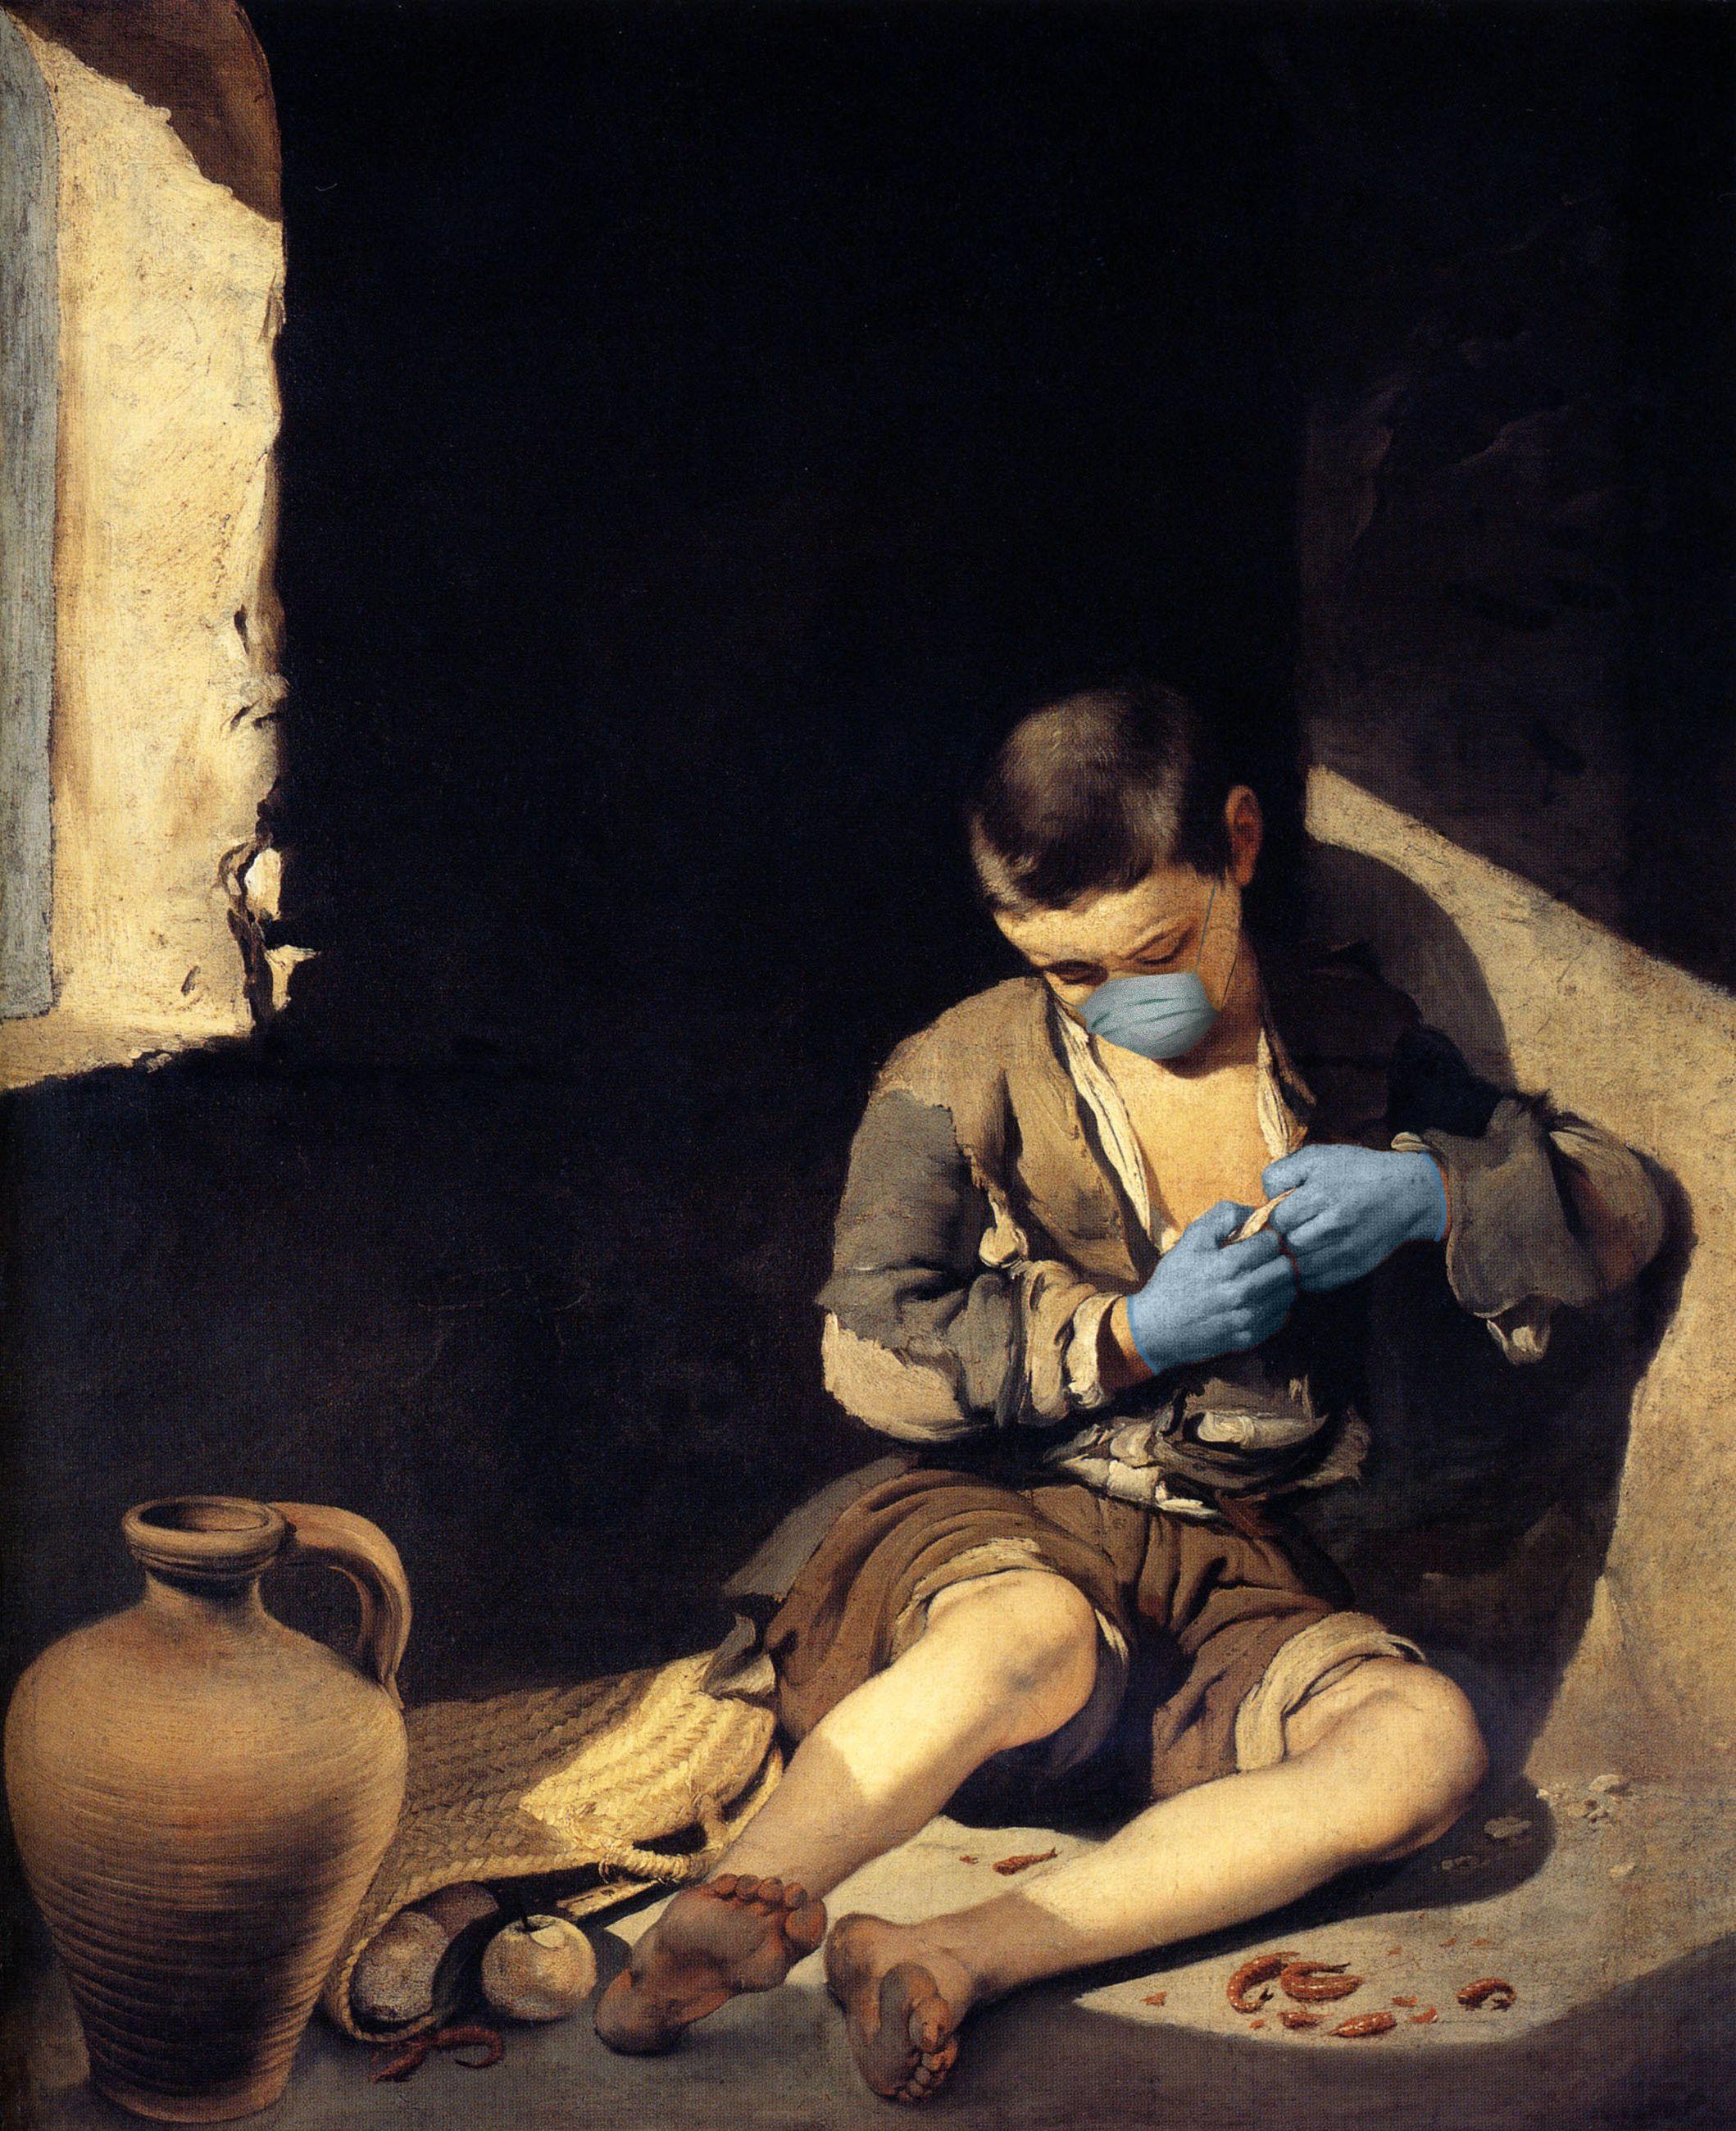 El Joven Mendigo / Bartolomé Esteban Murillo/POA Estudio